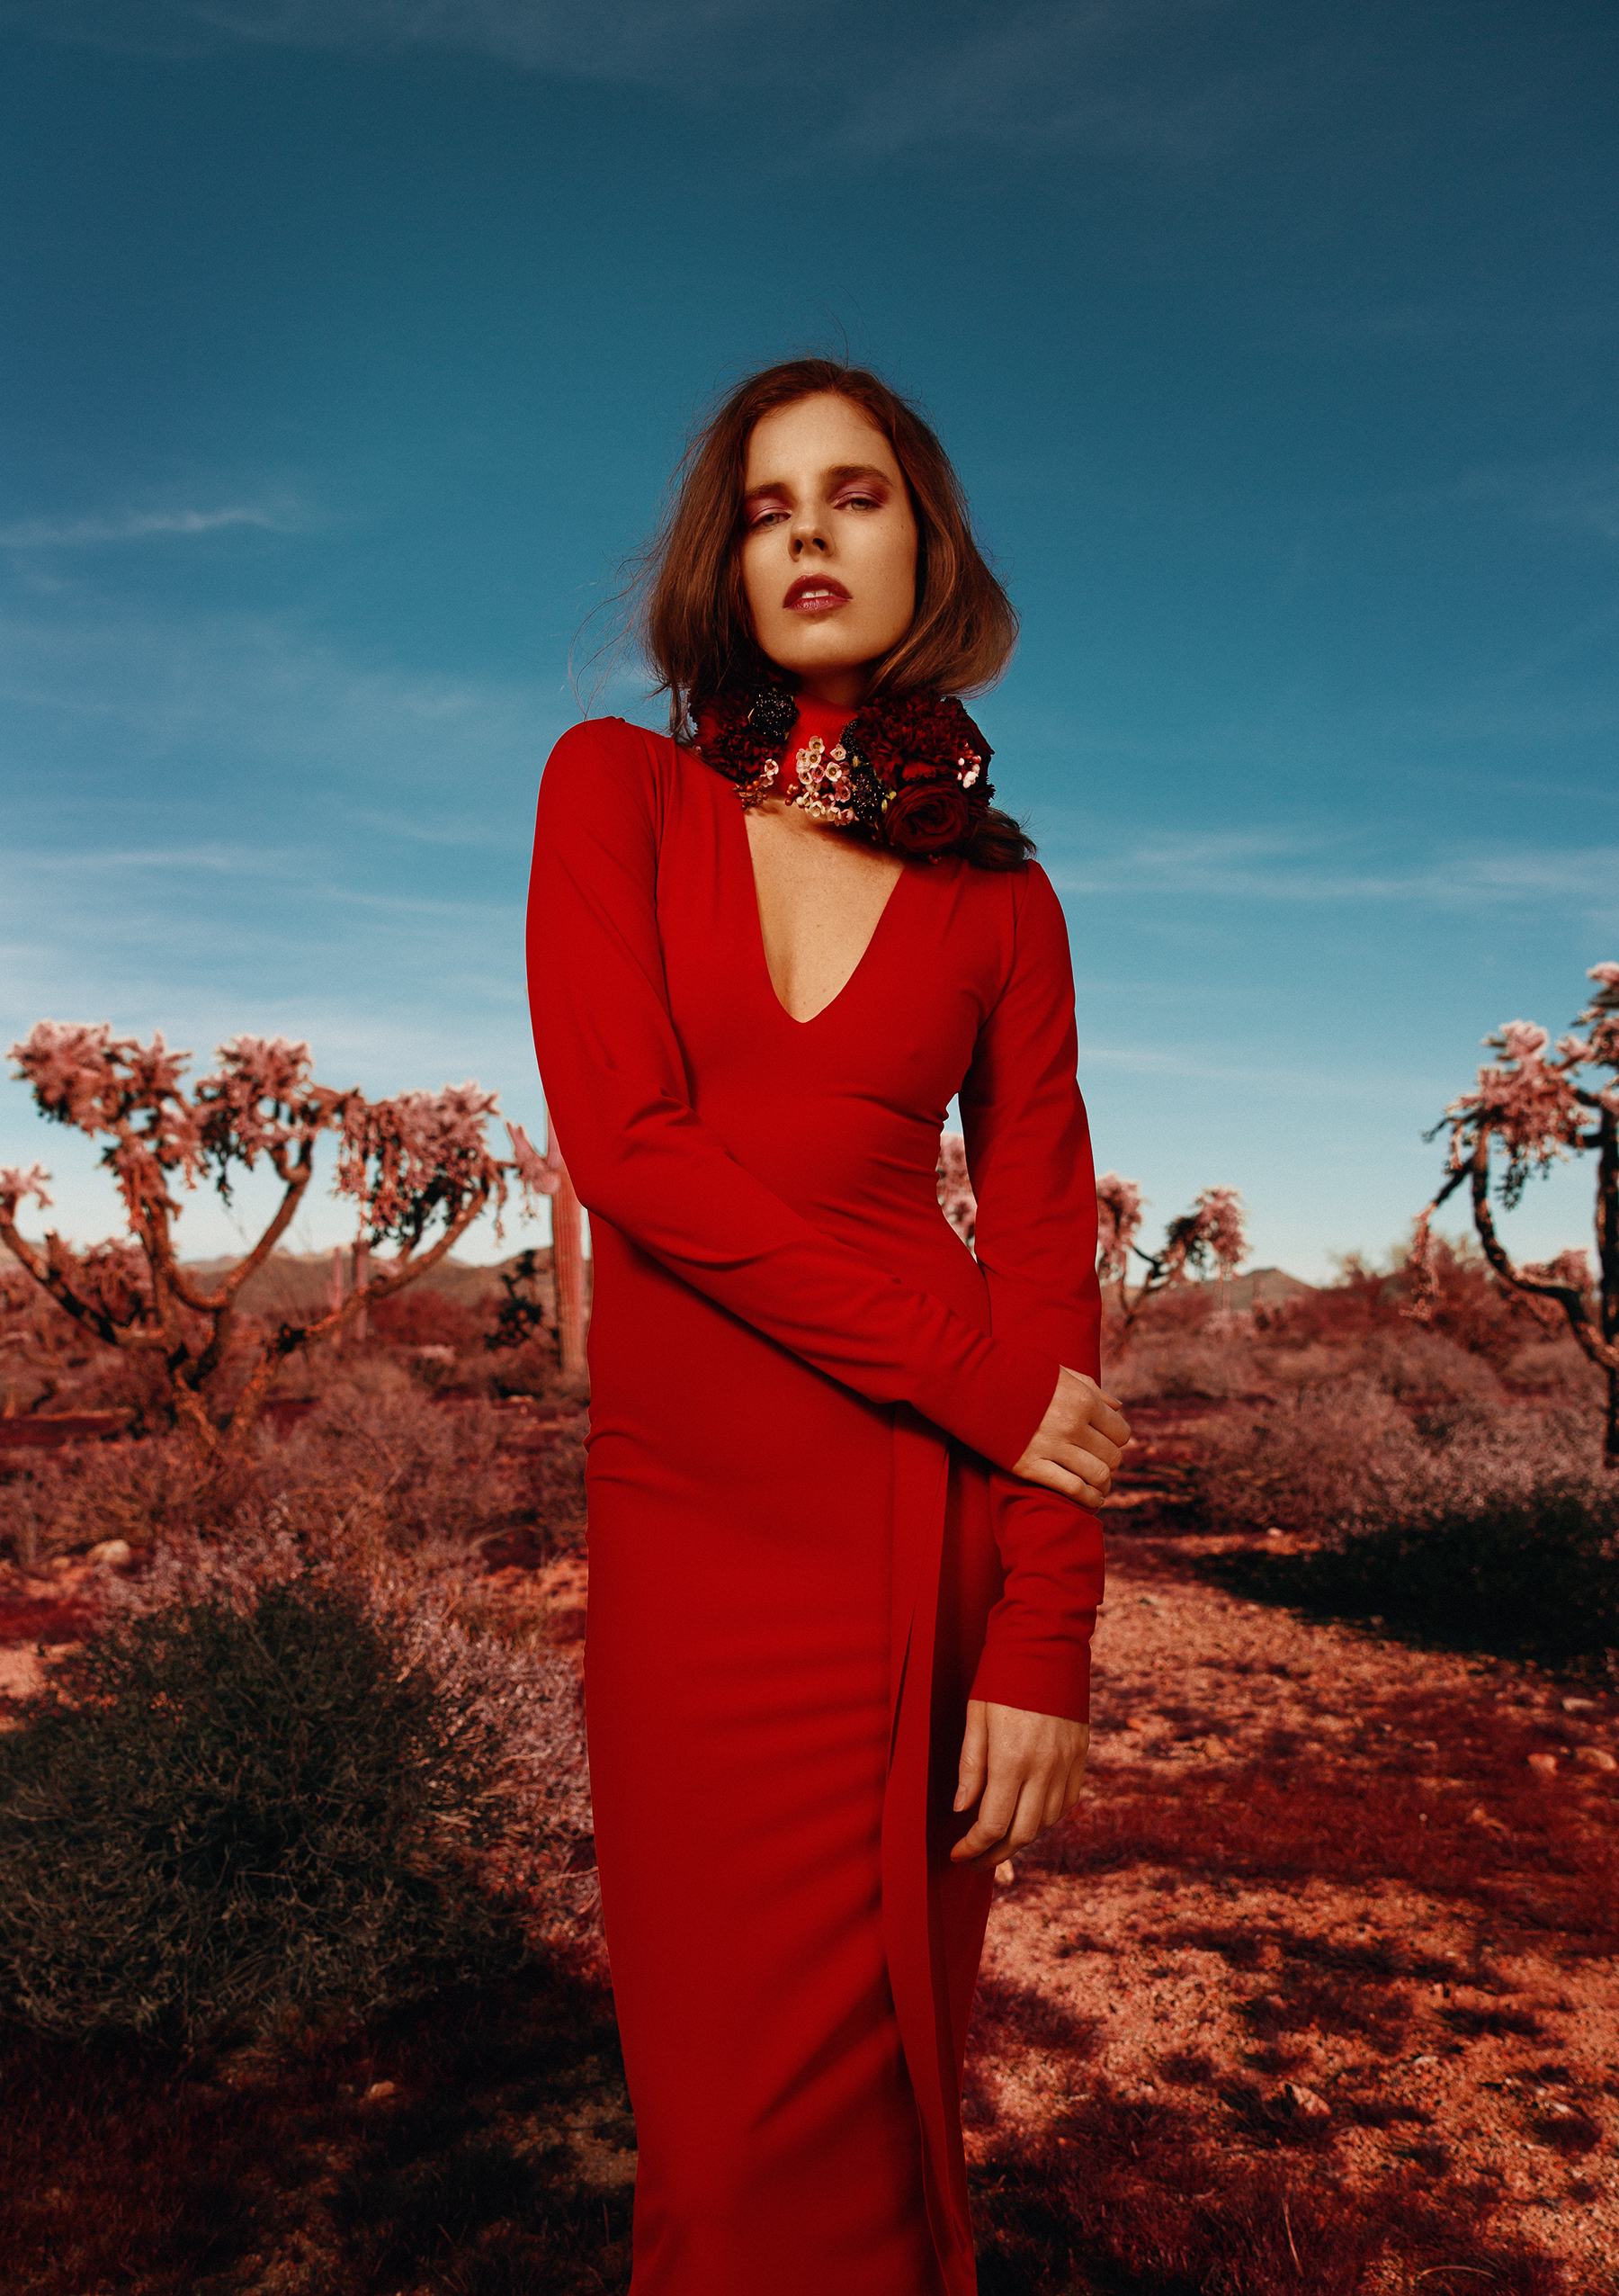 Phoenix Fashion Photographer